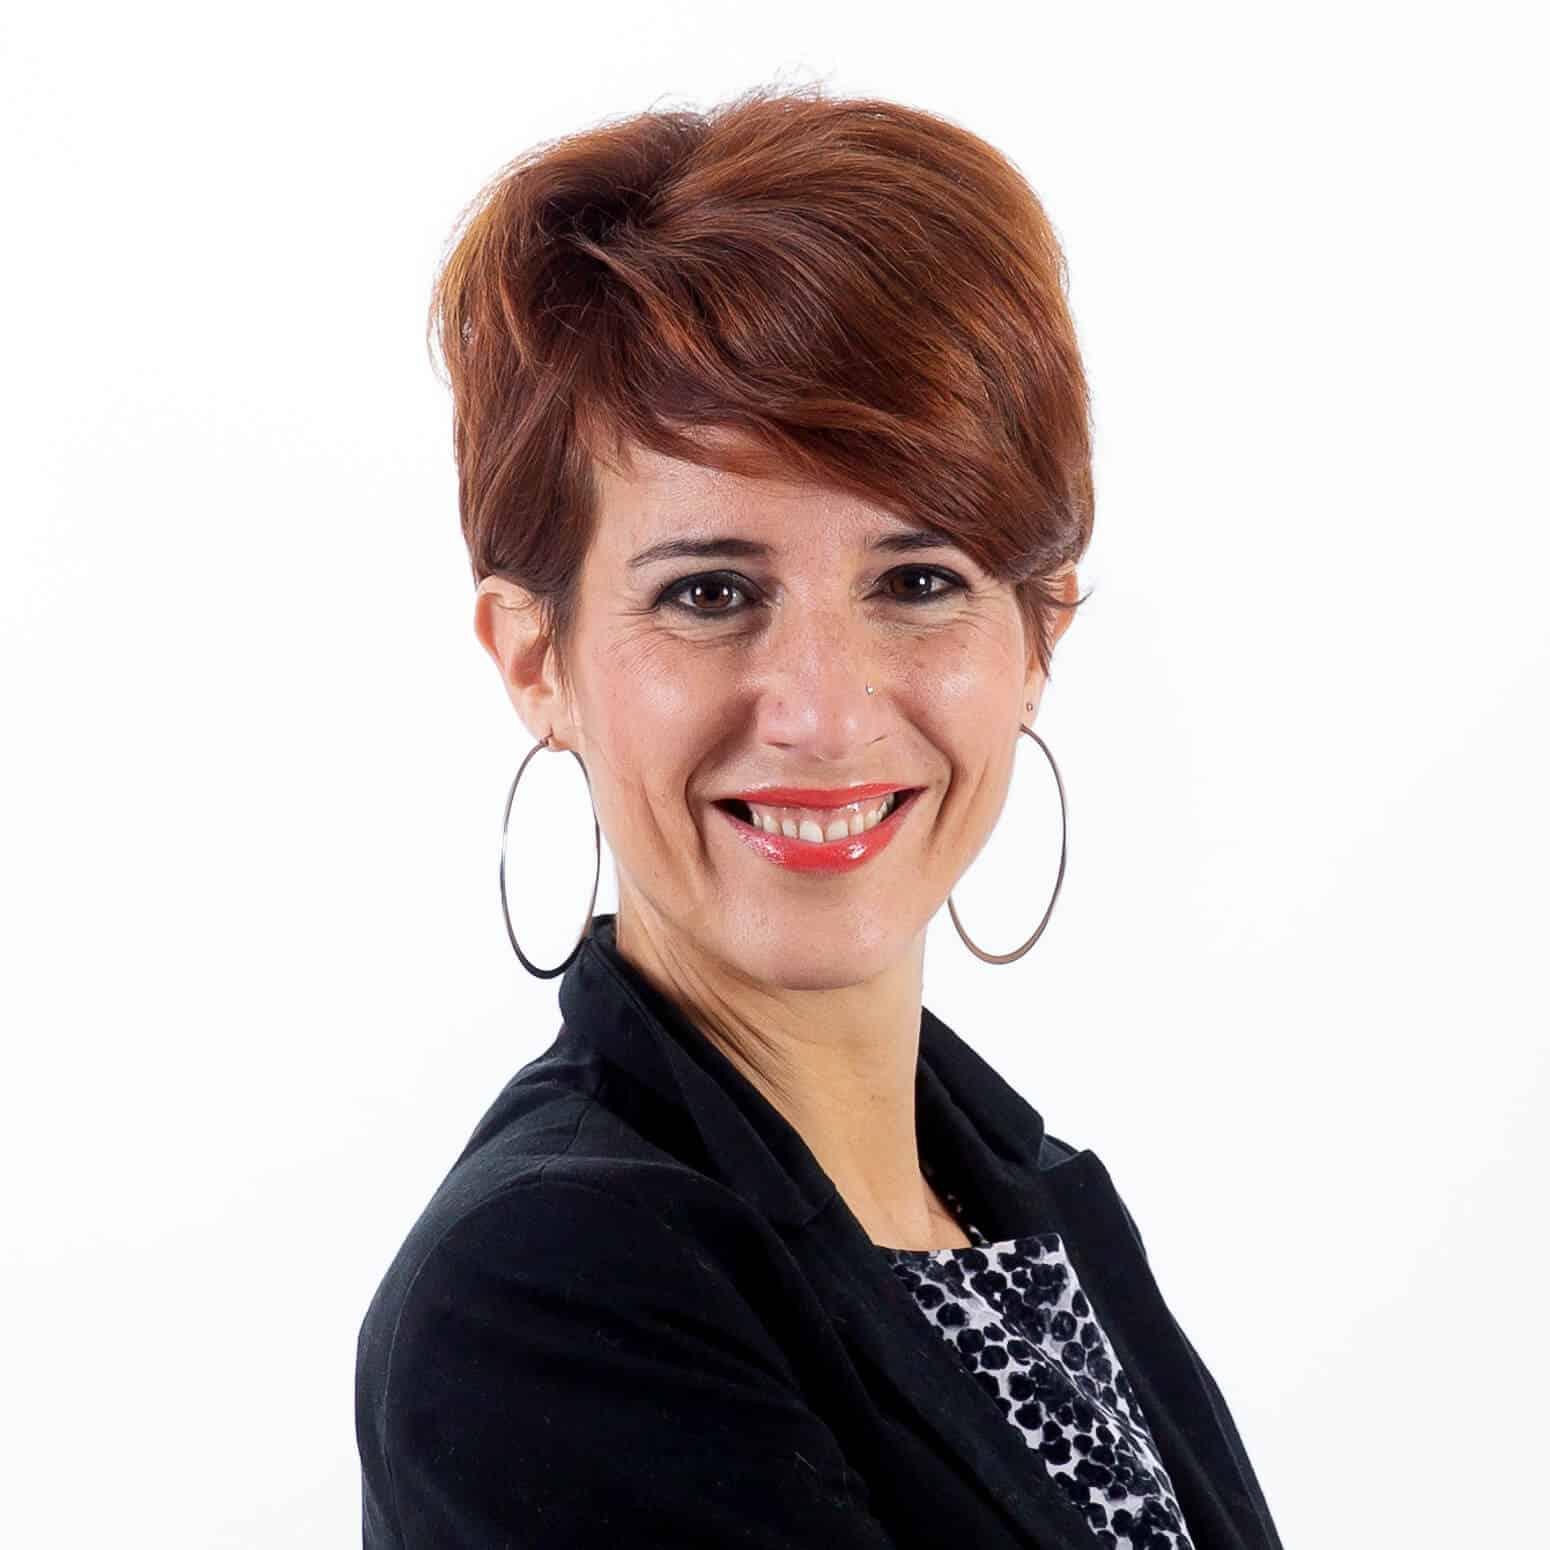 Ana Santaolalla Pascual